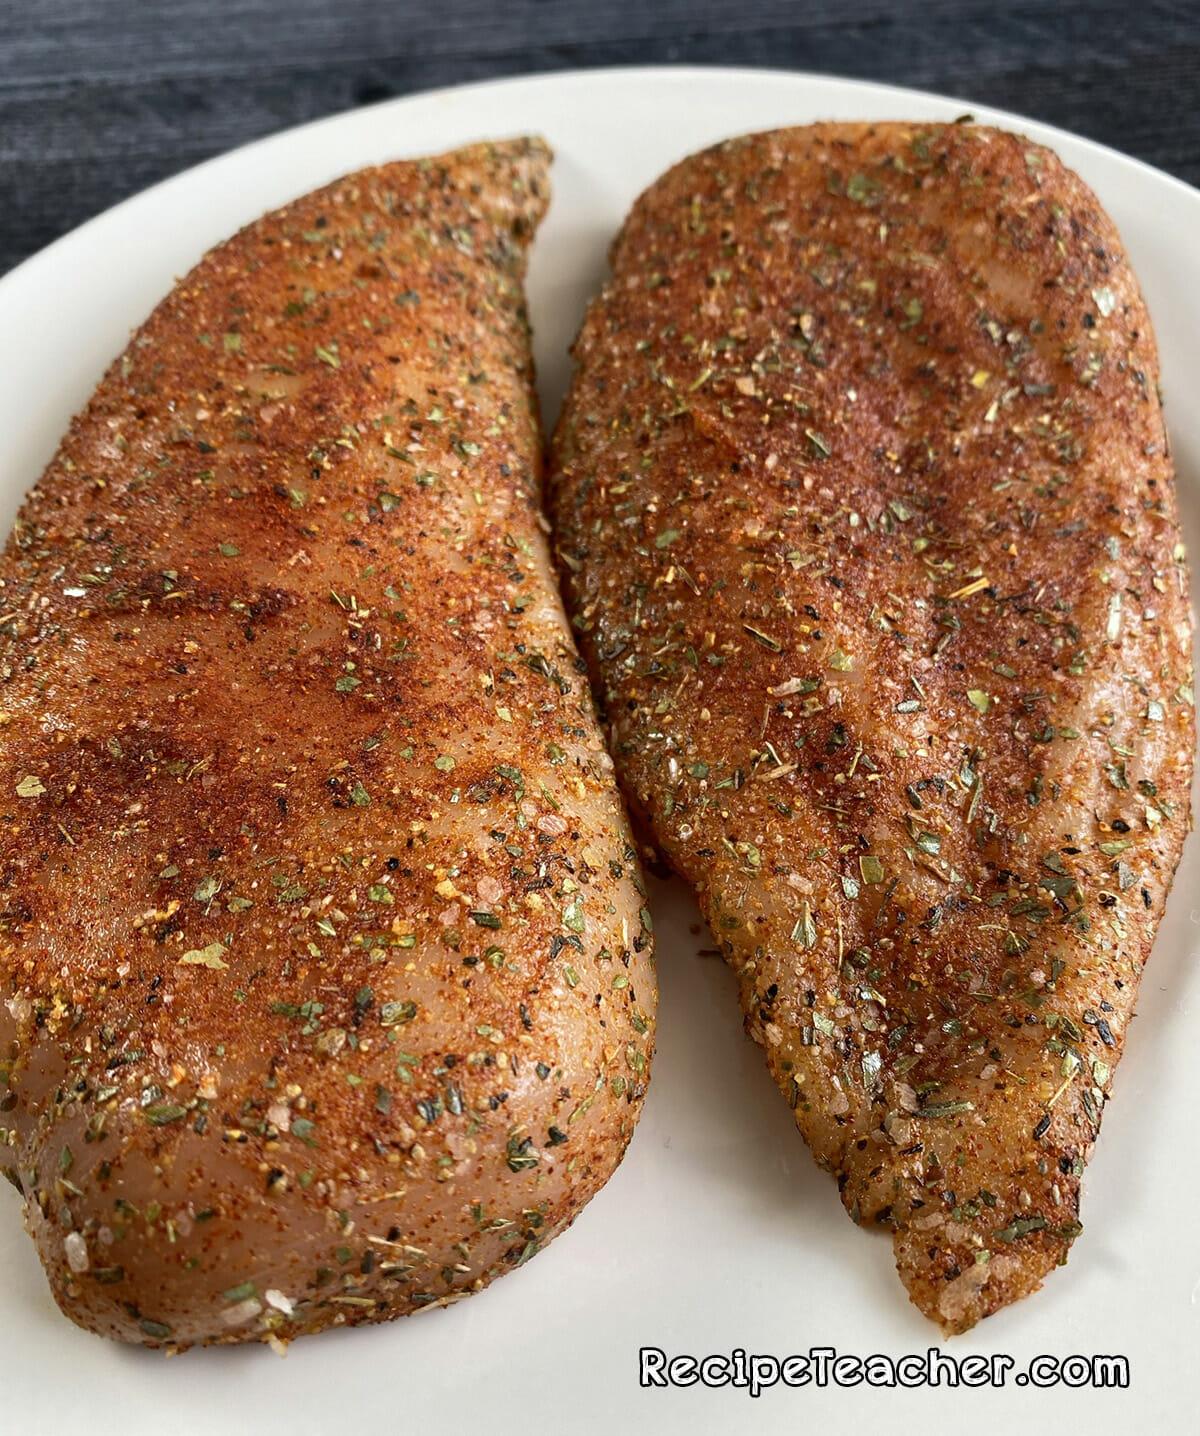 Recipe for air fryer boneless skinless chicken breasts